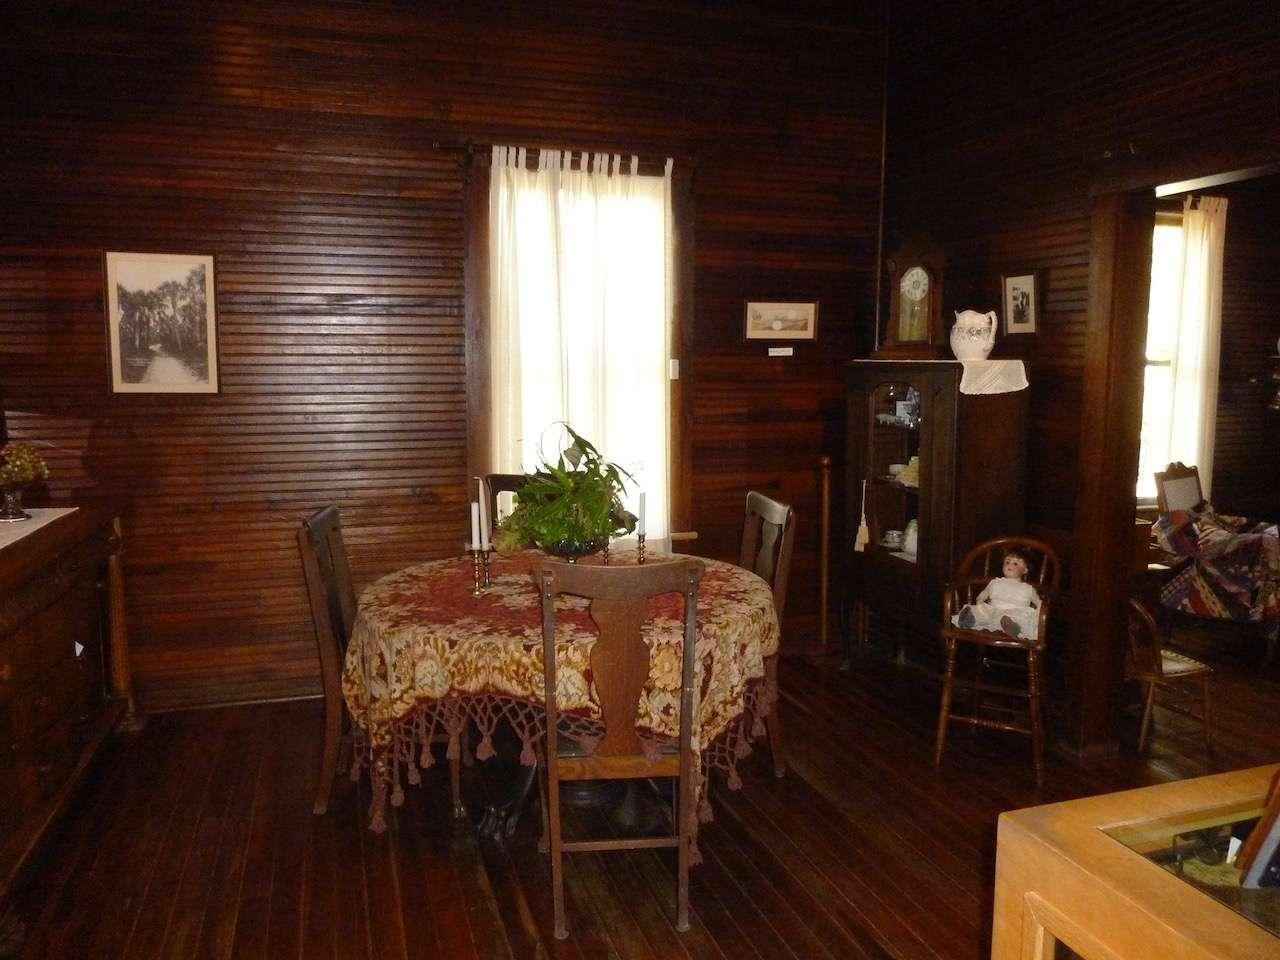 Sanibel Island Museum